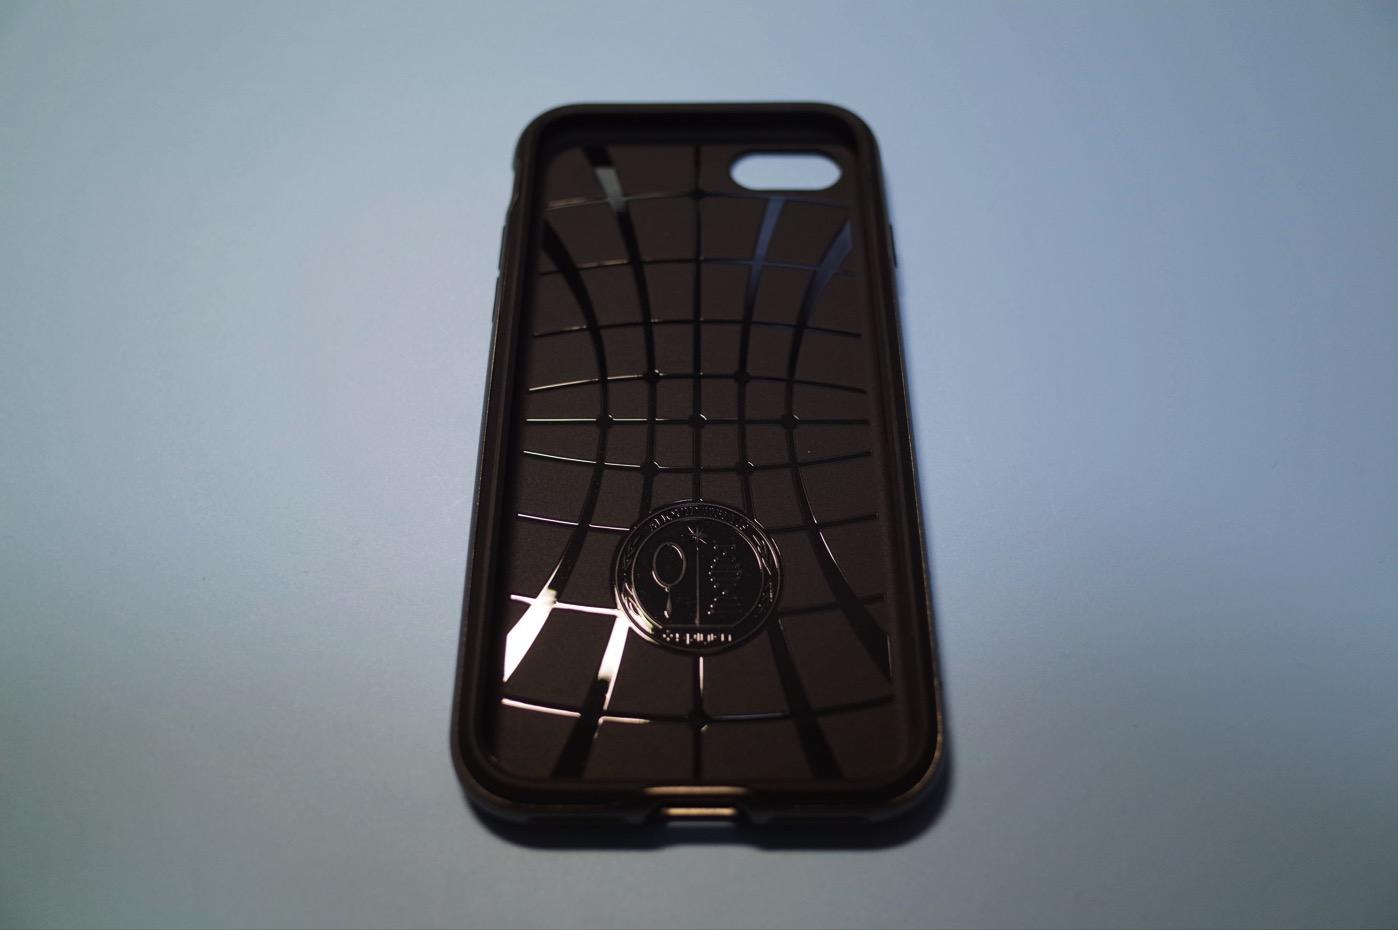 iPhoneケース「ネオ・ハイブリッド米軍MIL規格取得 二重構造バンパー」-4